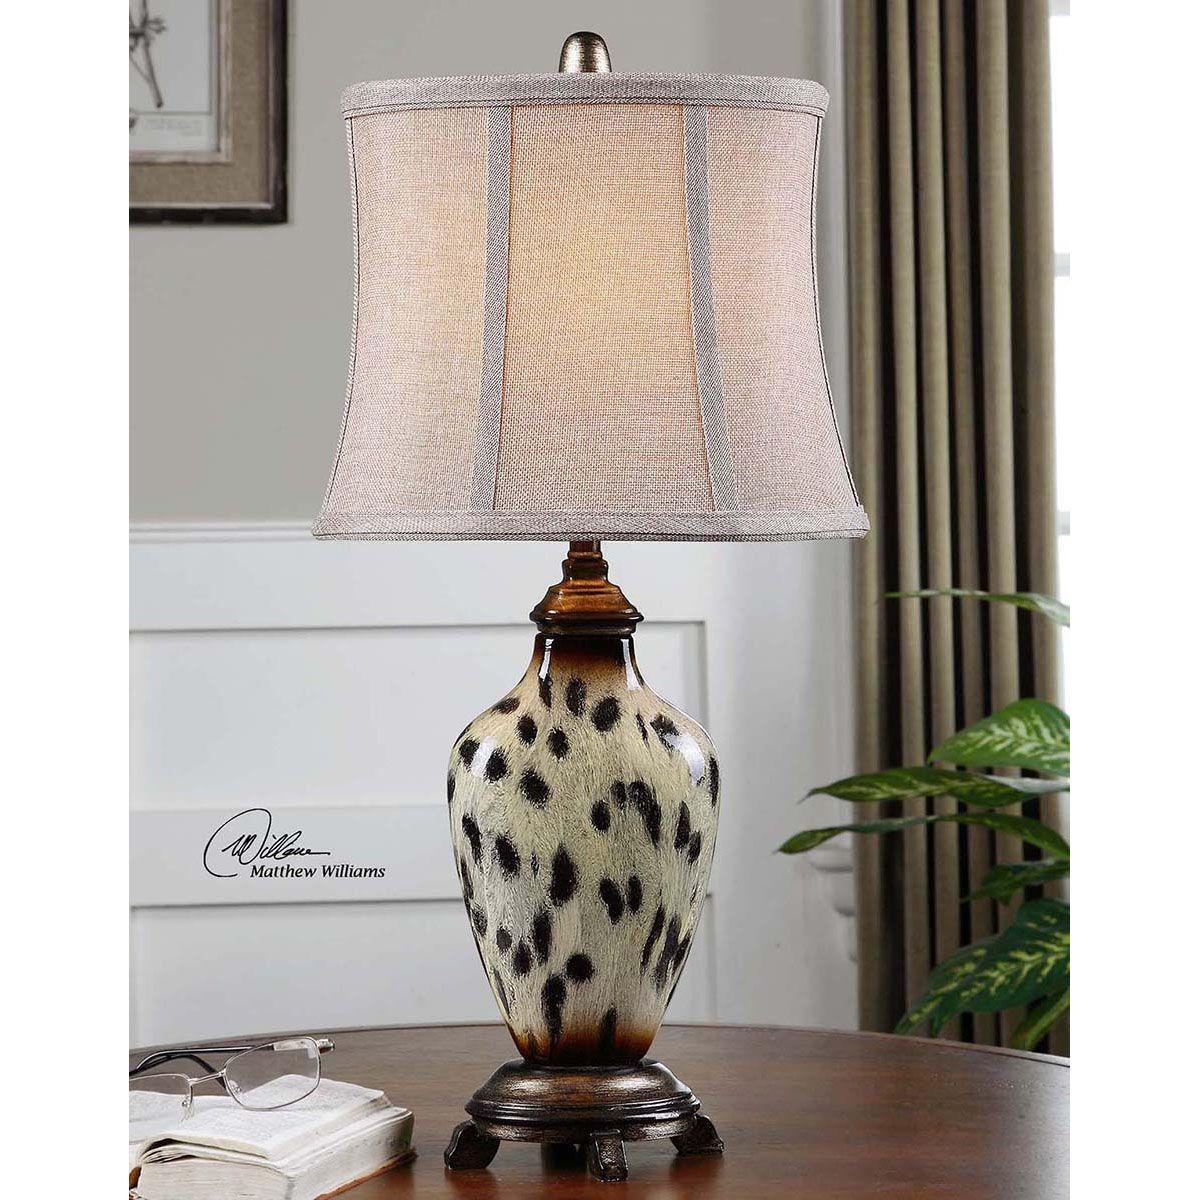 Uttermost malawi cheetah print table lamp 29931 1 uttermost uttermost malawi cheetah print table lamp 29931 1 geotapseo Choice Image